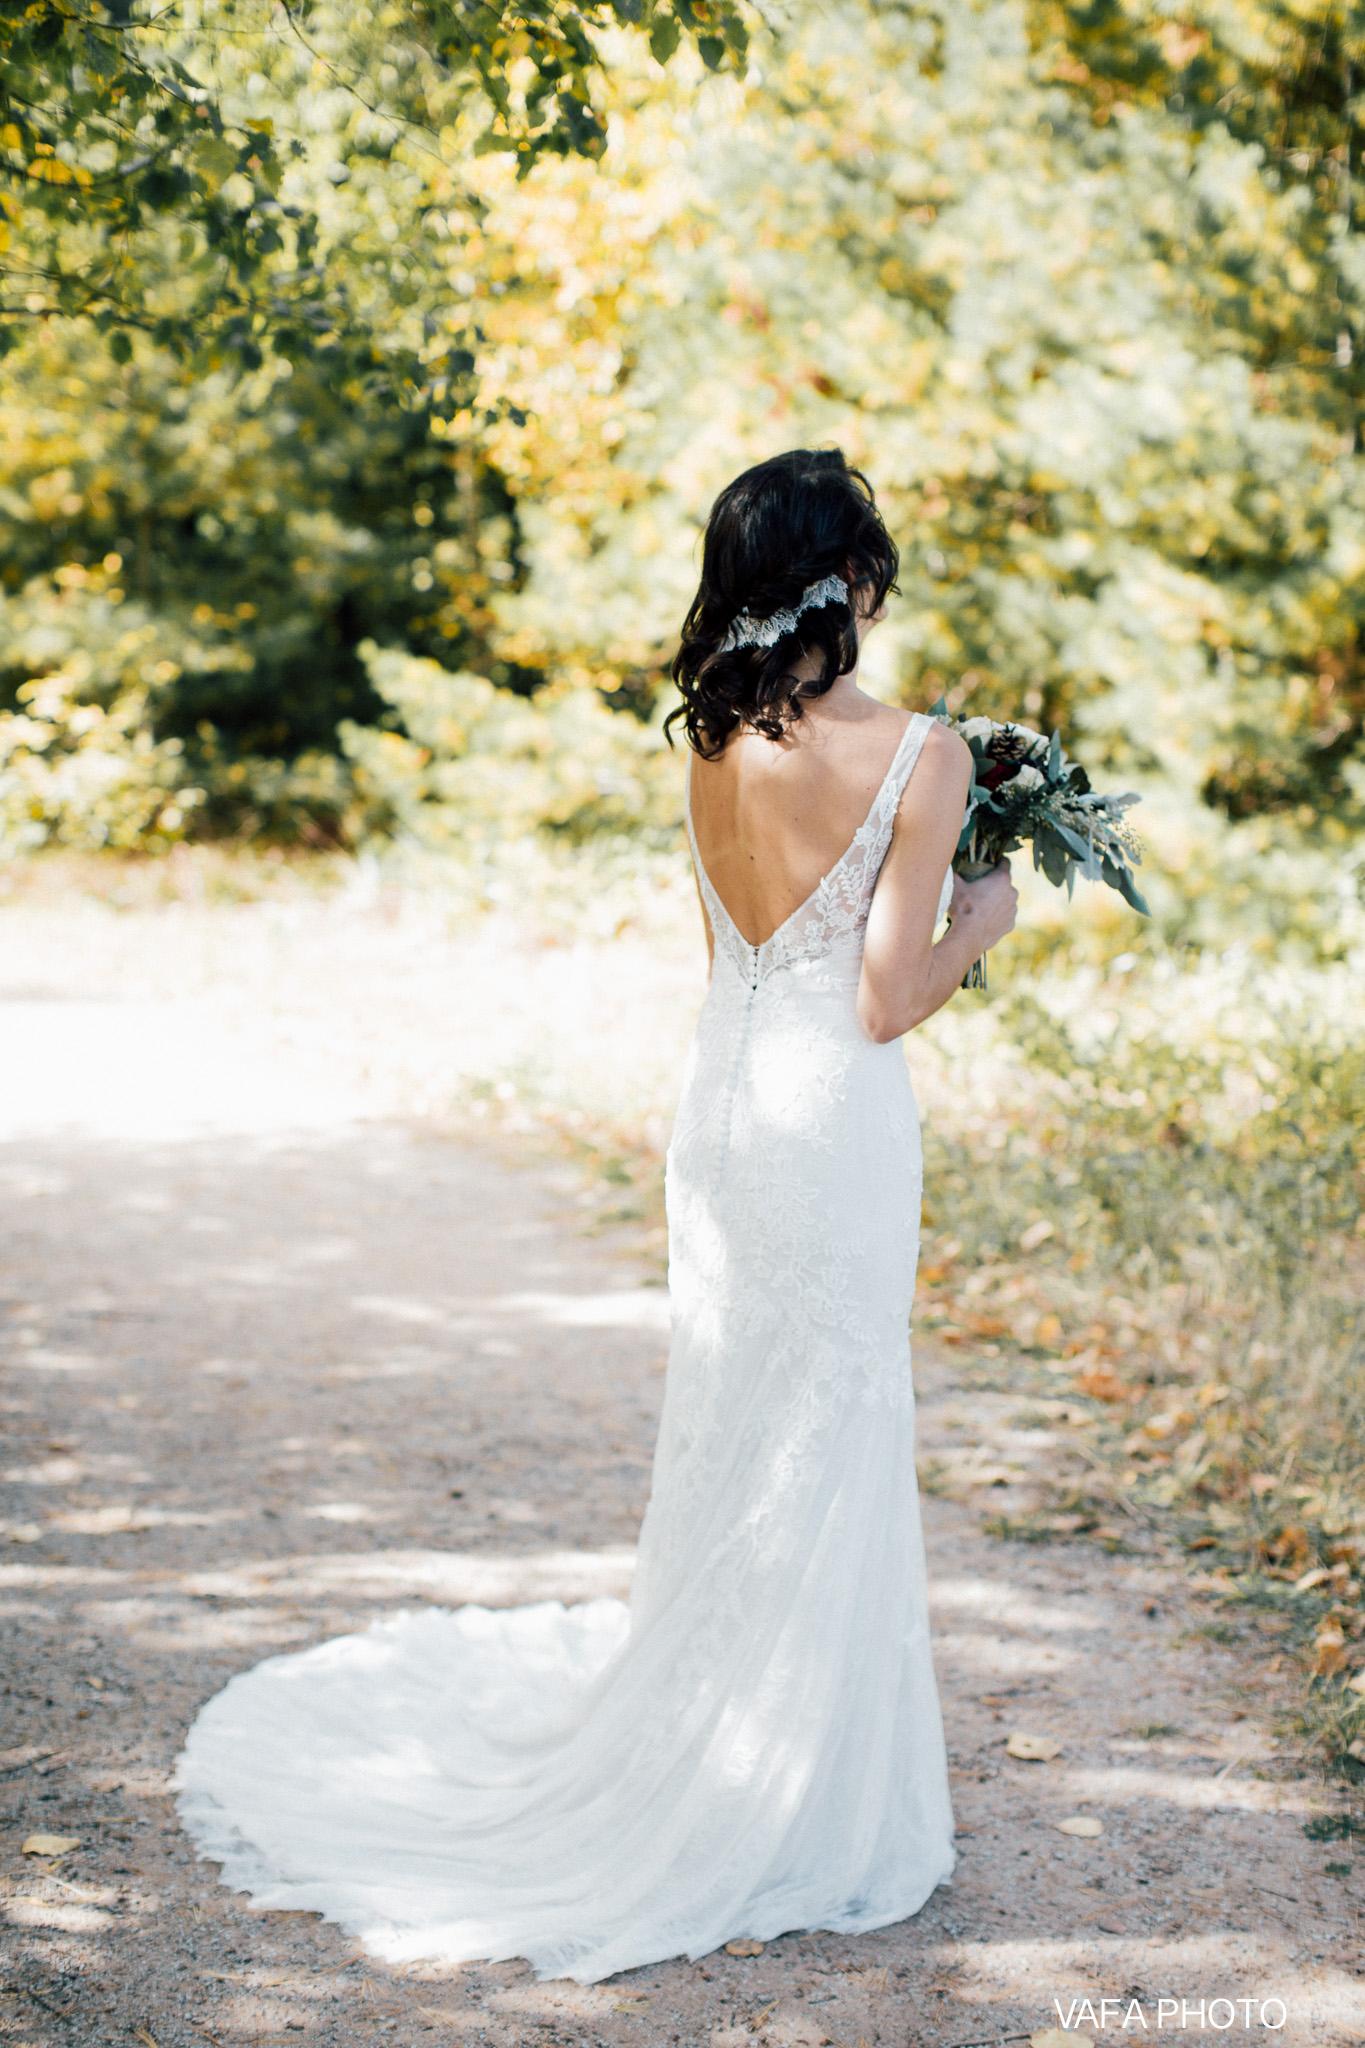 Hogback-Mountain-Wedding-Chelsea-Josh-Vafa-Photo-602.jpg